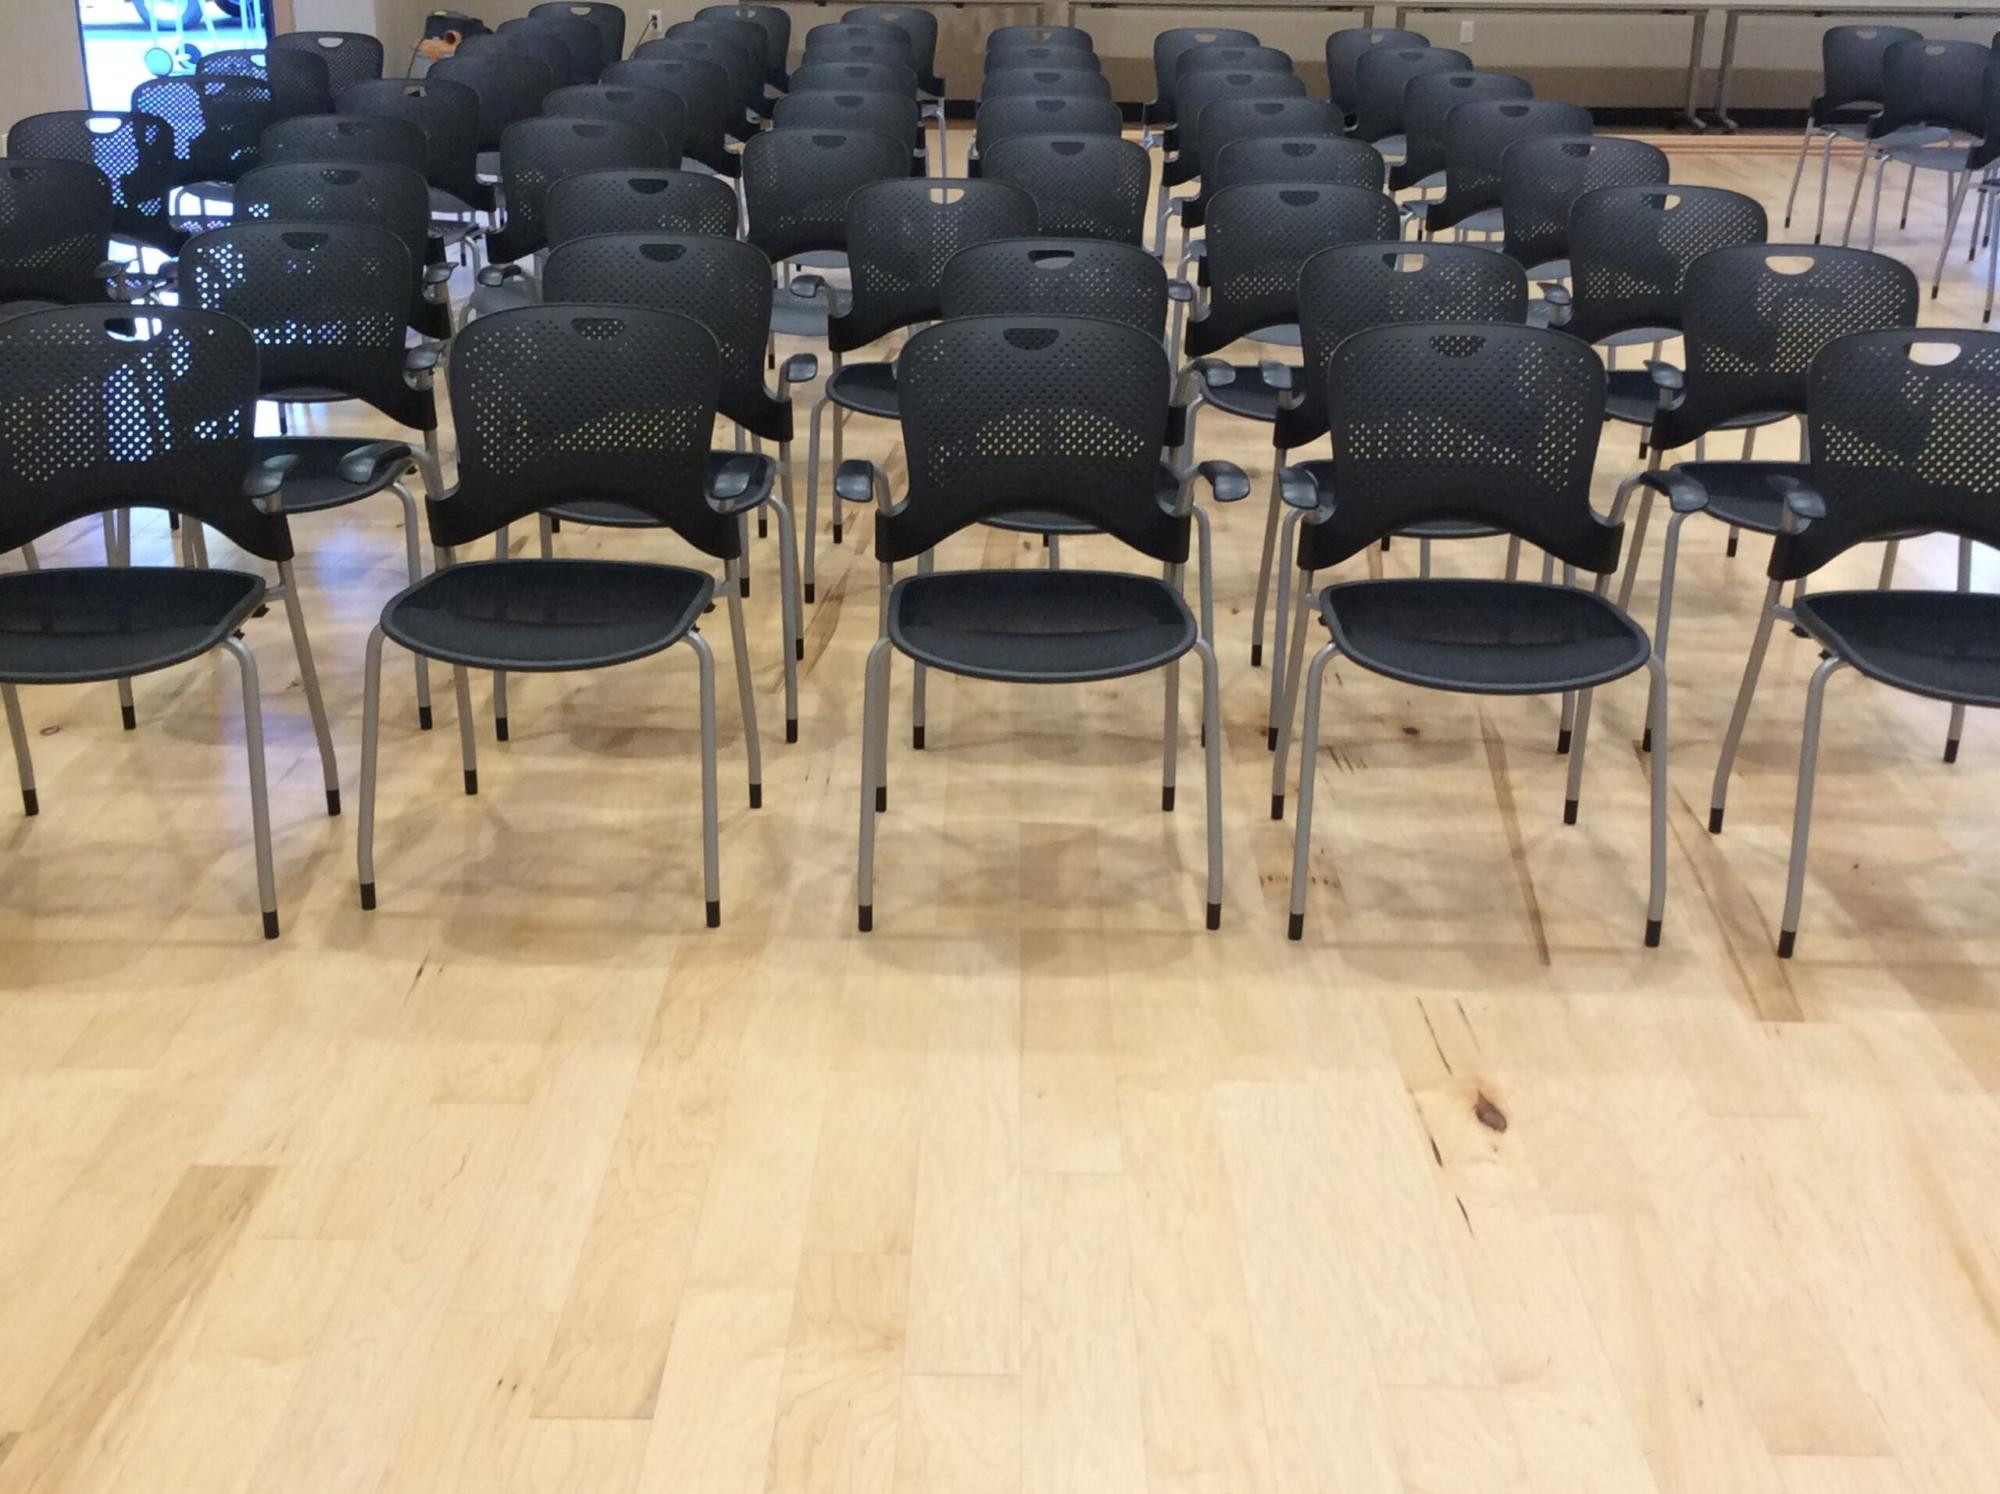 Meeting Hall Seating